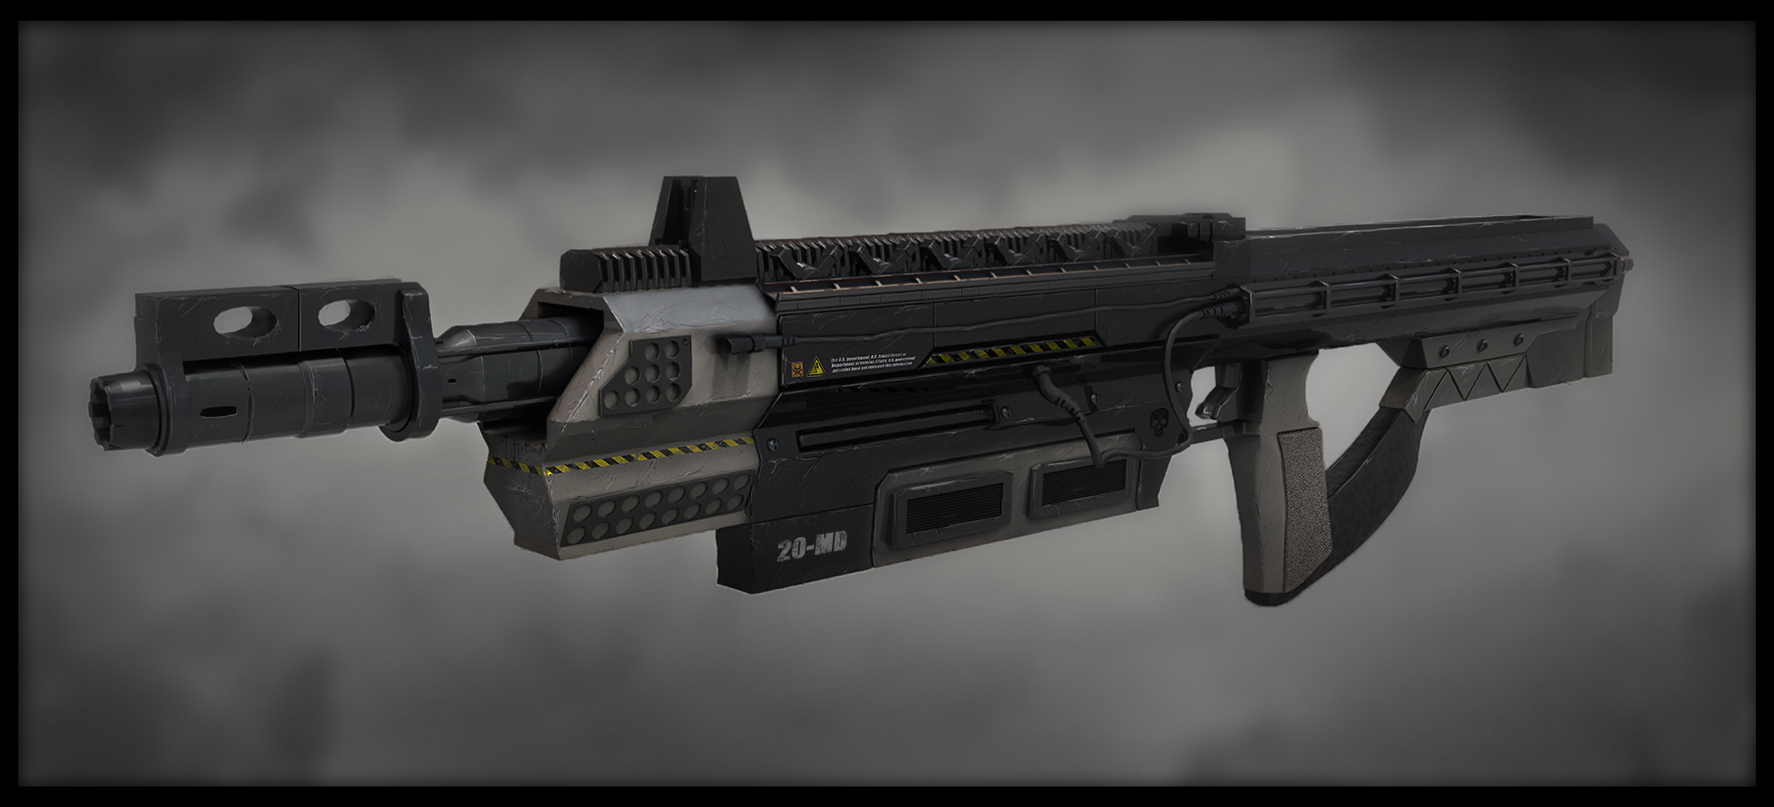 Real Futuristic Weapon...